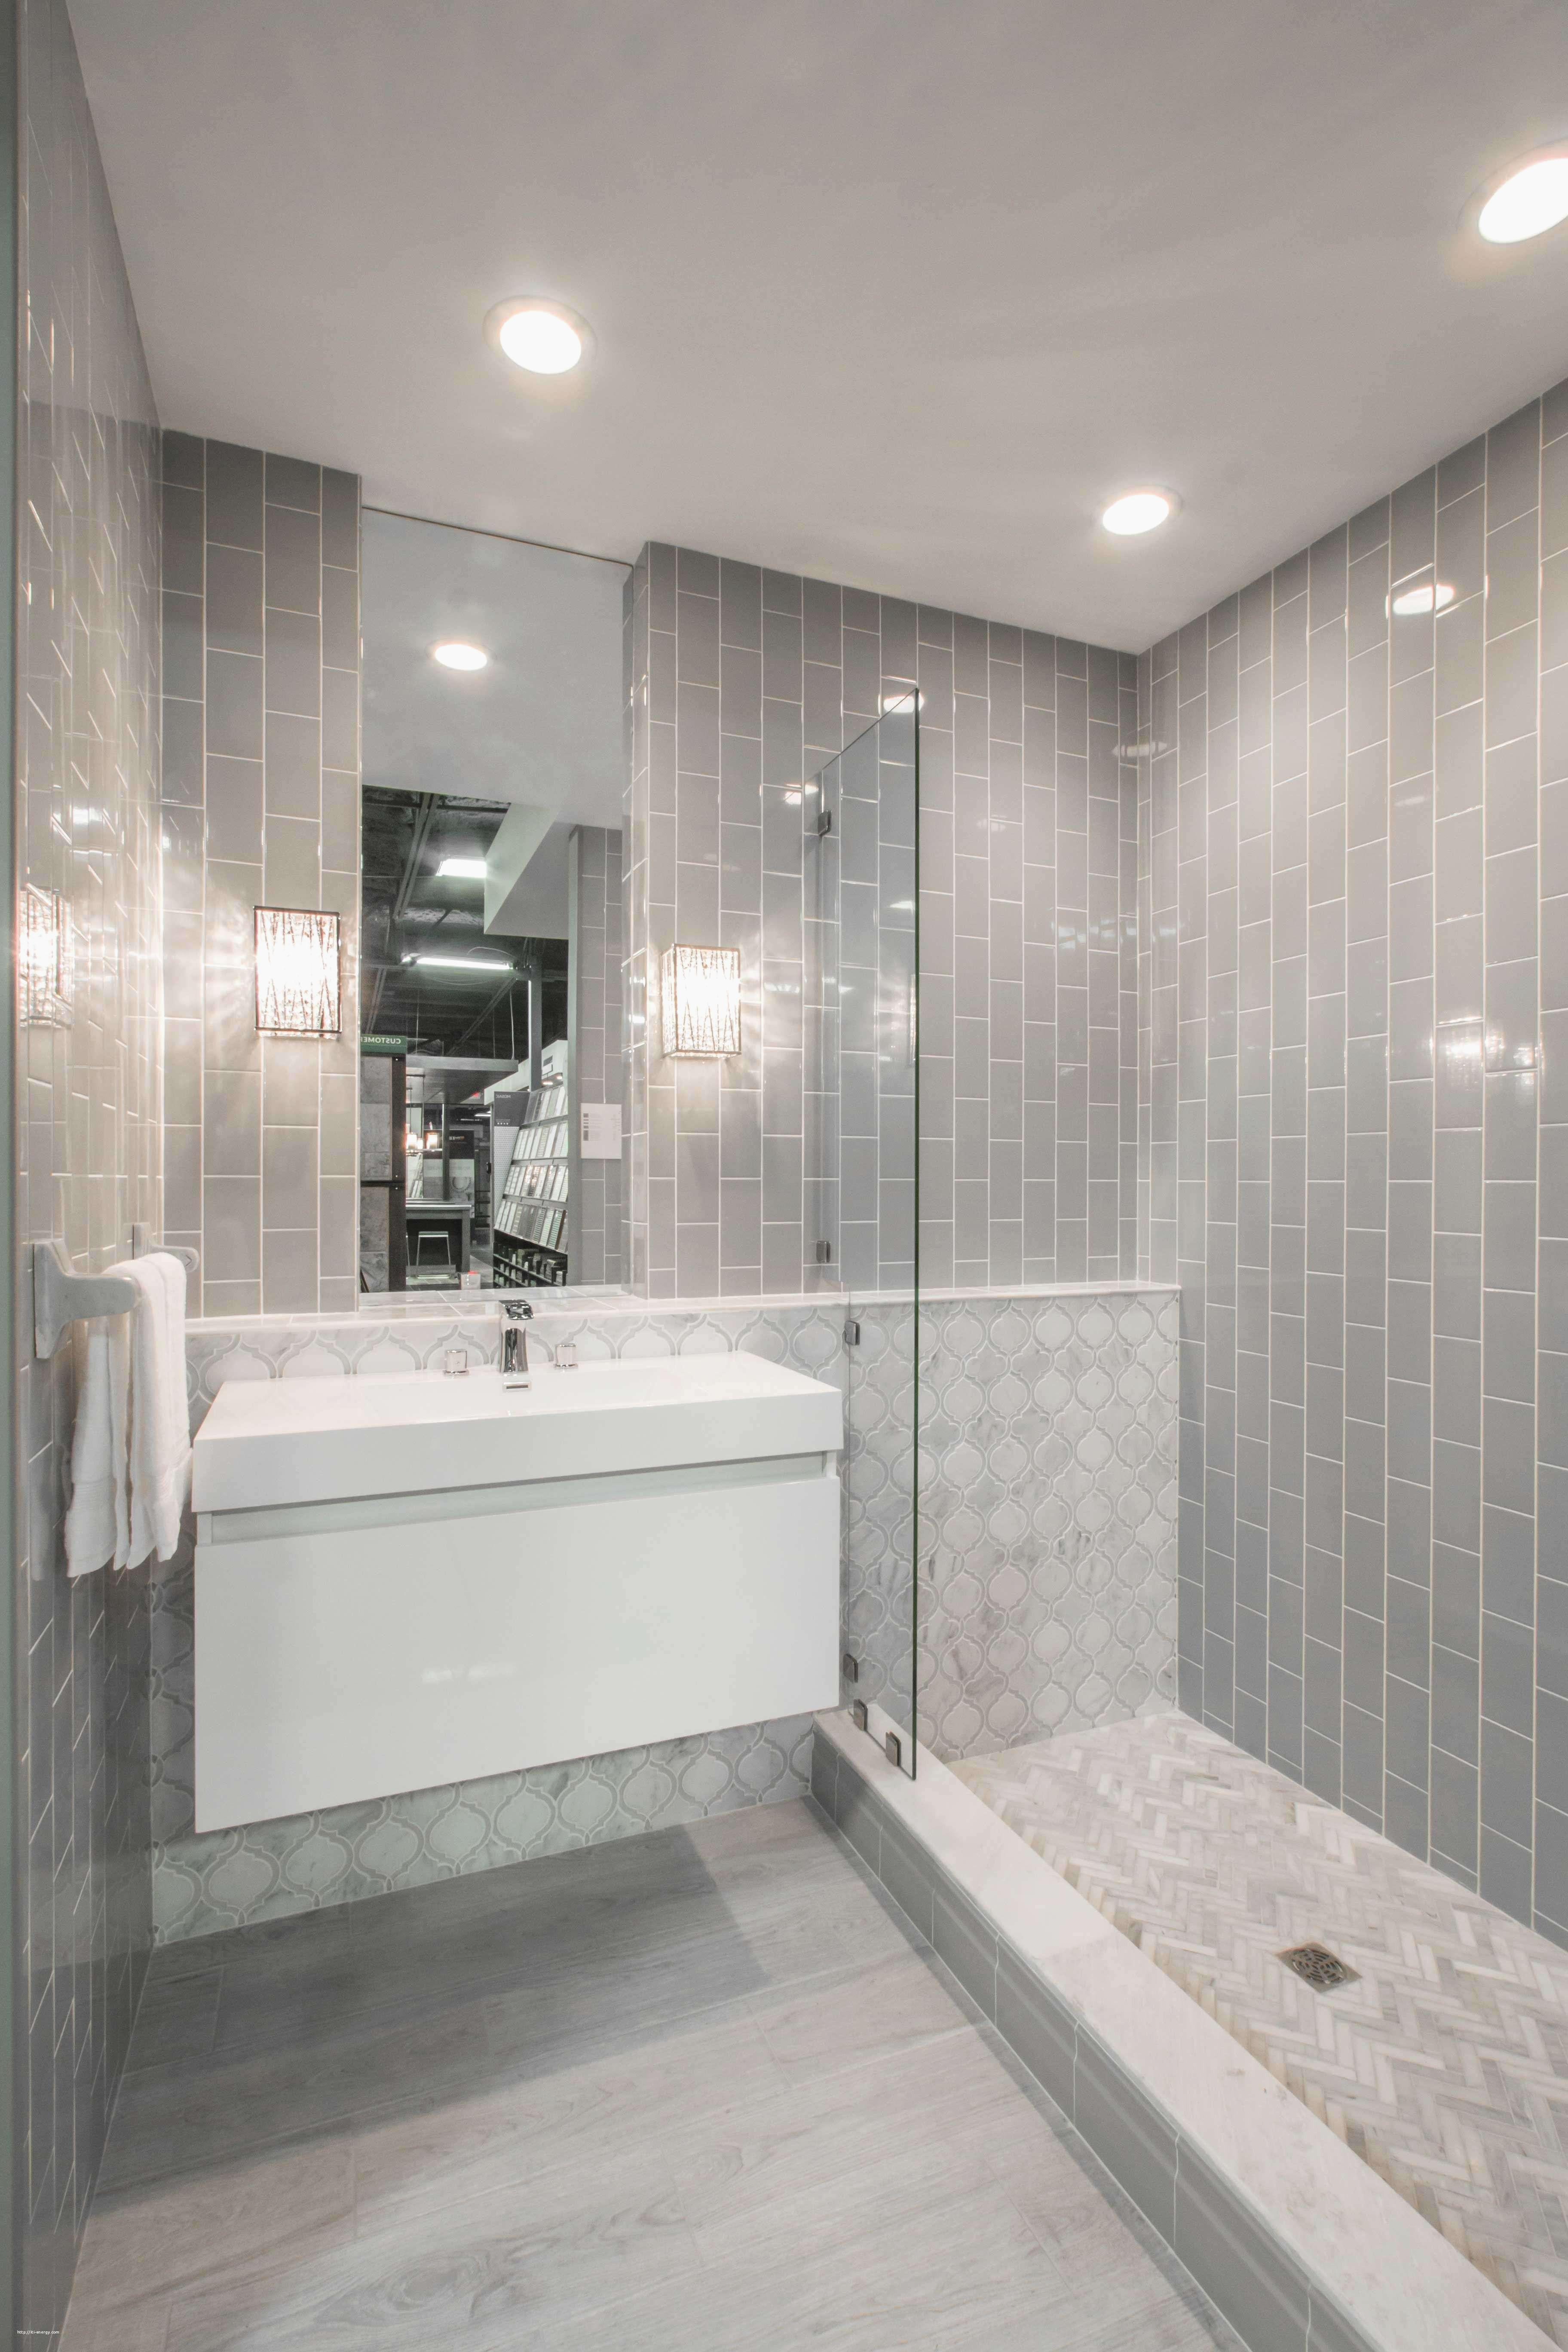 Astounding Small Modern Bathroom Ideas Of New Fresh White Acnn Decor